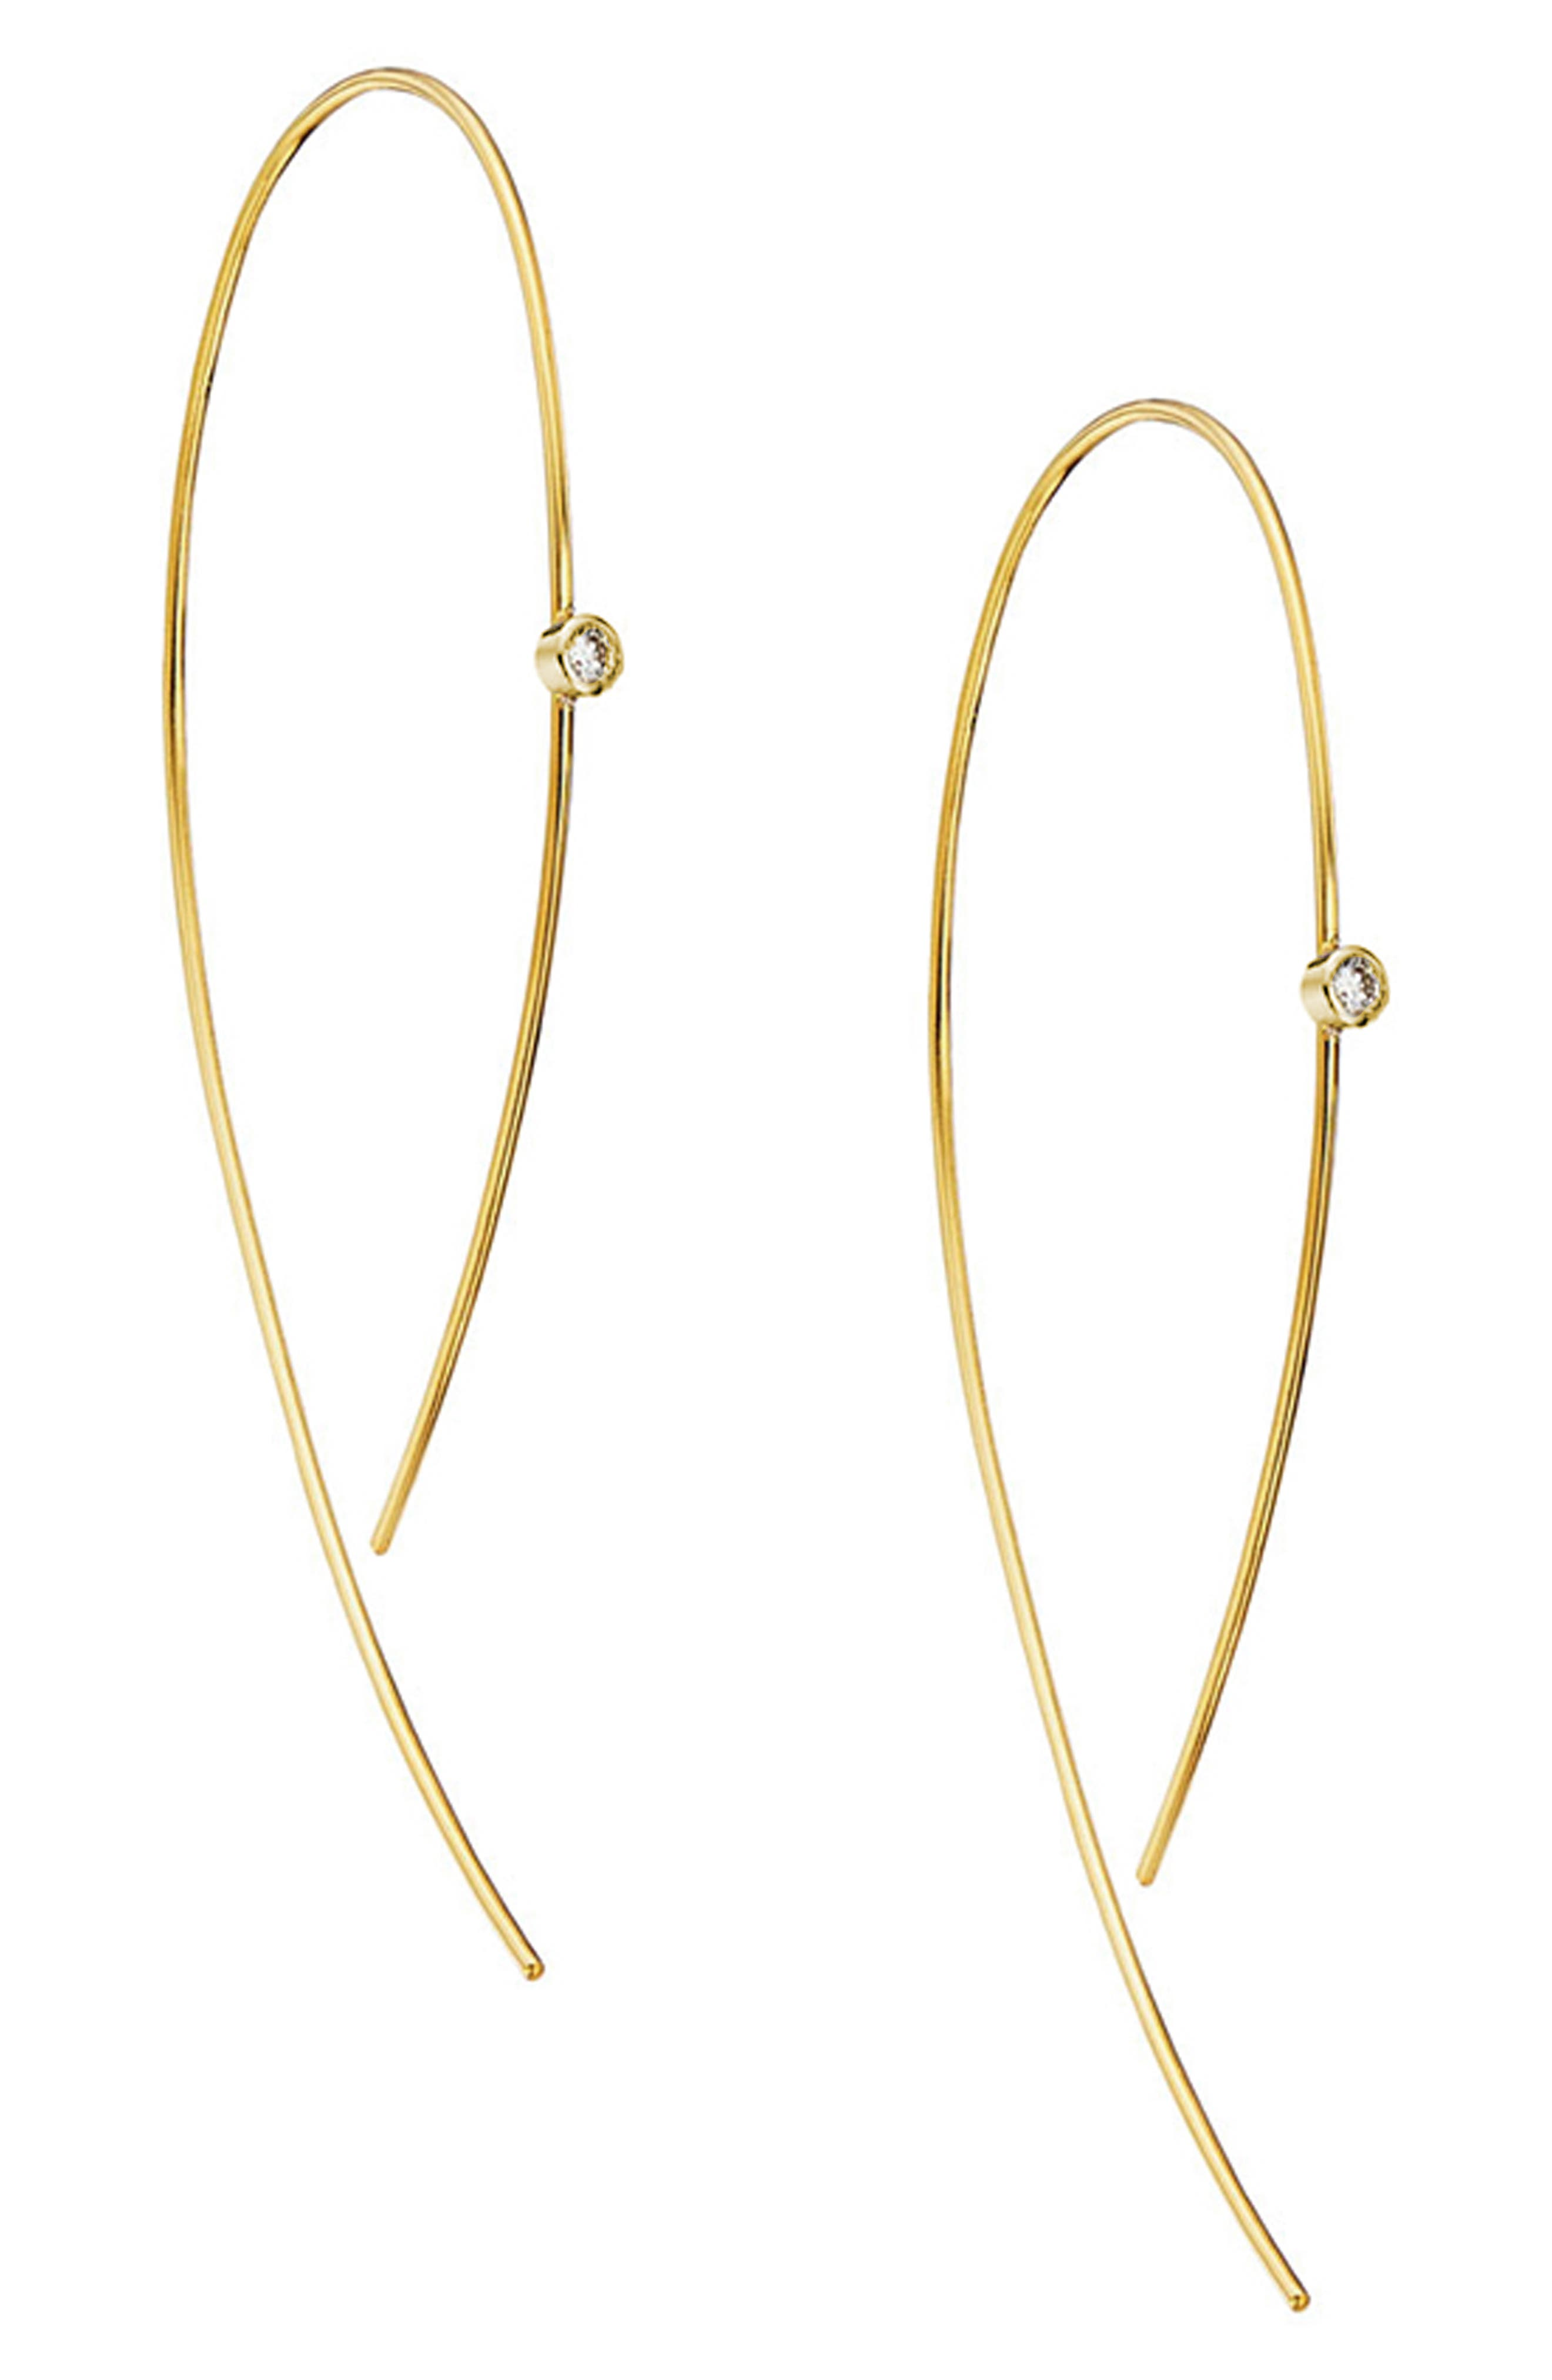 'Hooked On Hoops' Diamond Earrings